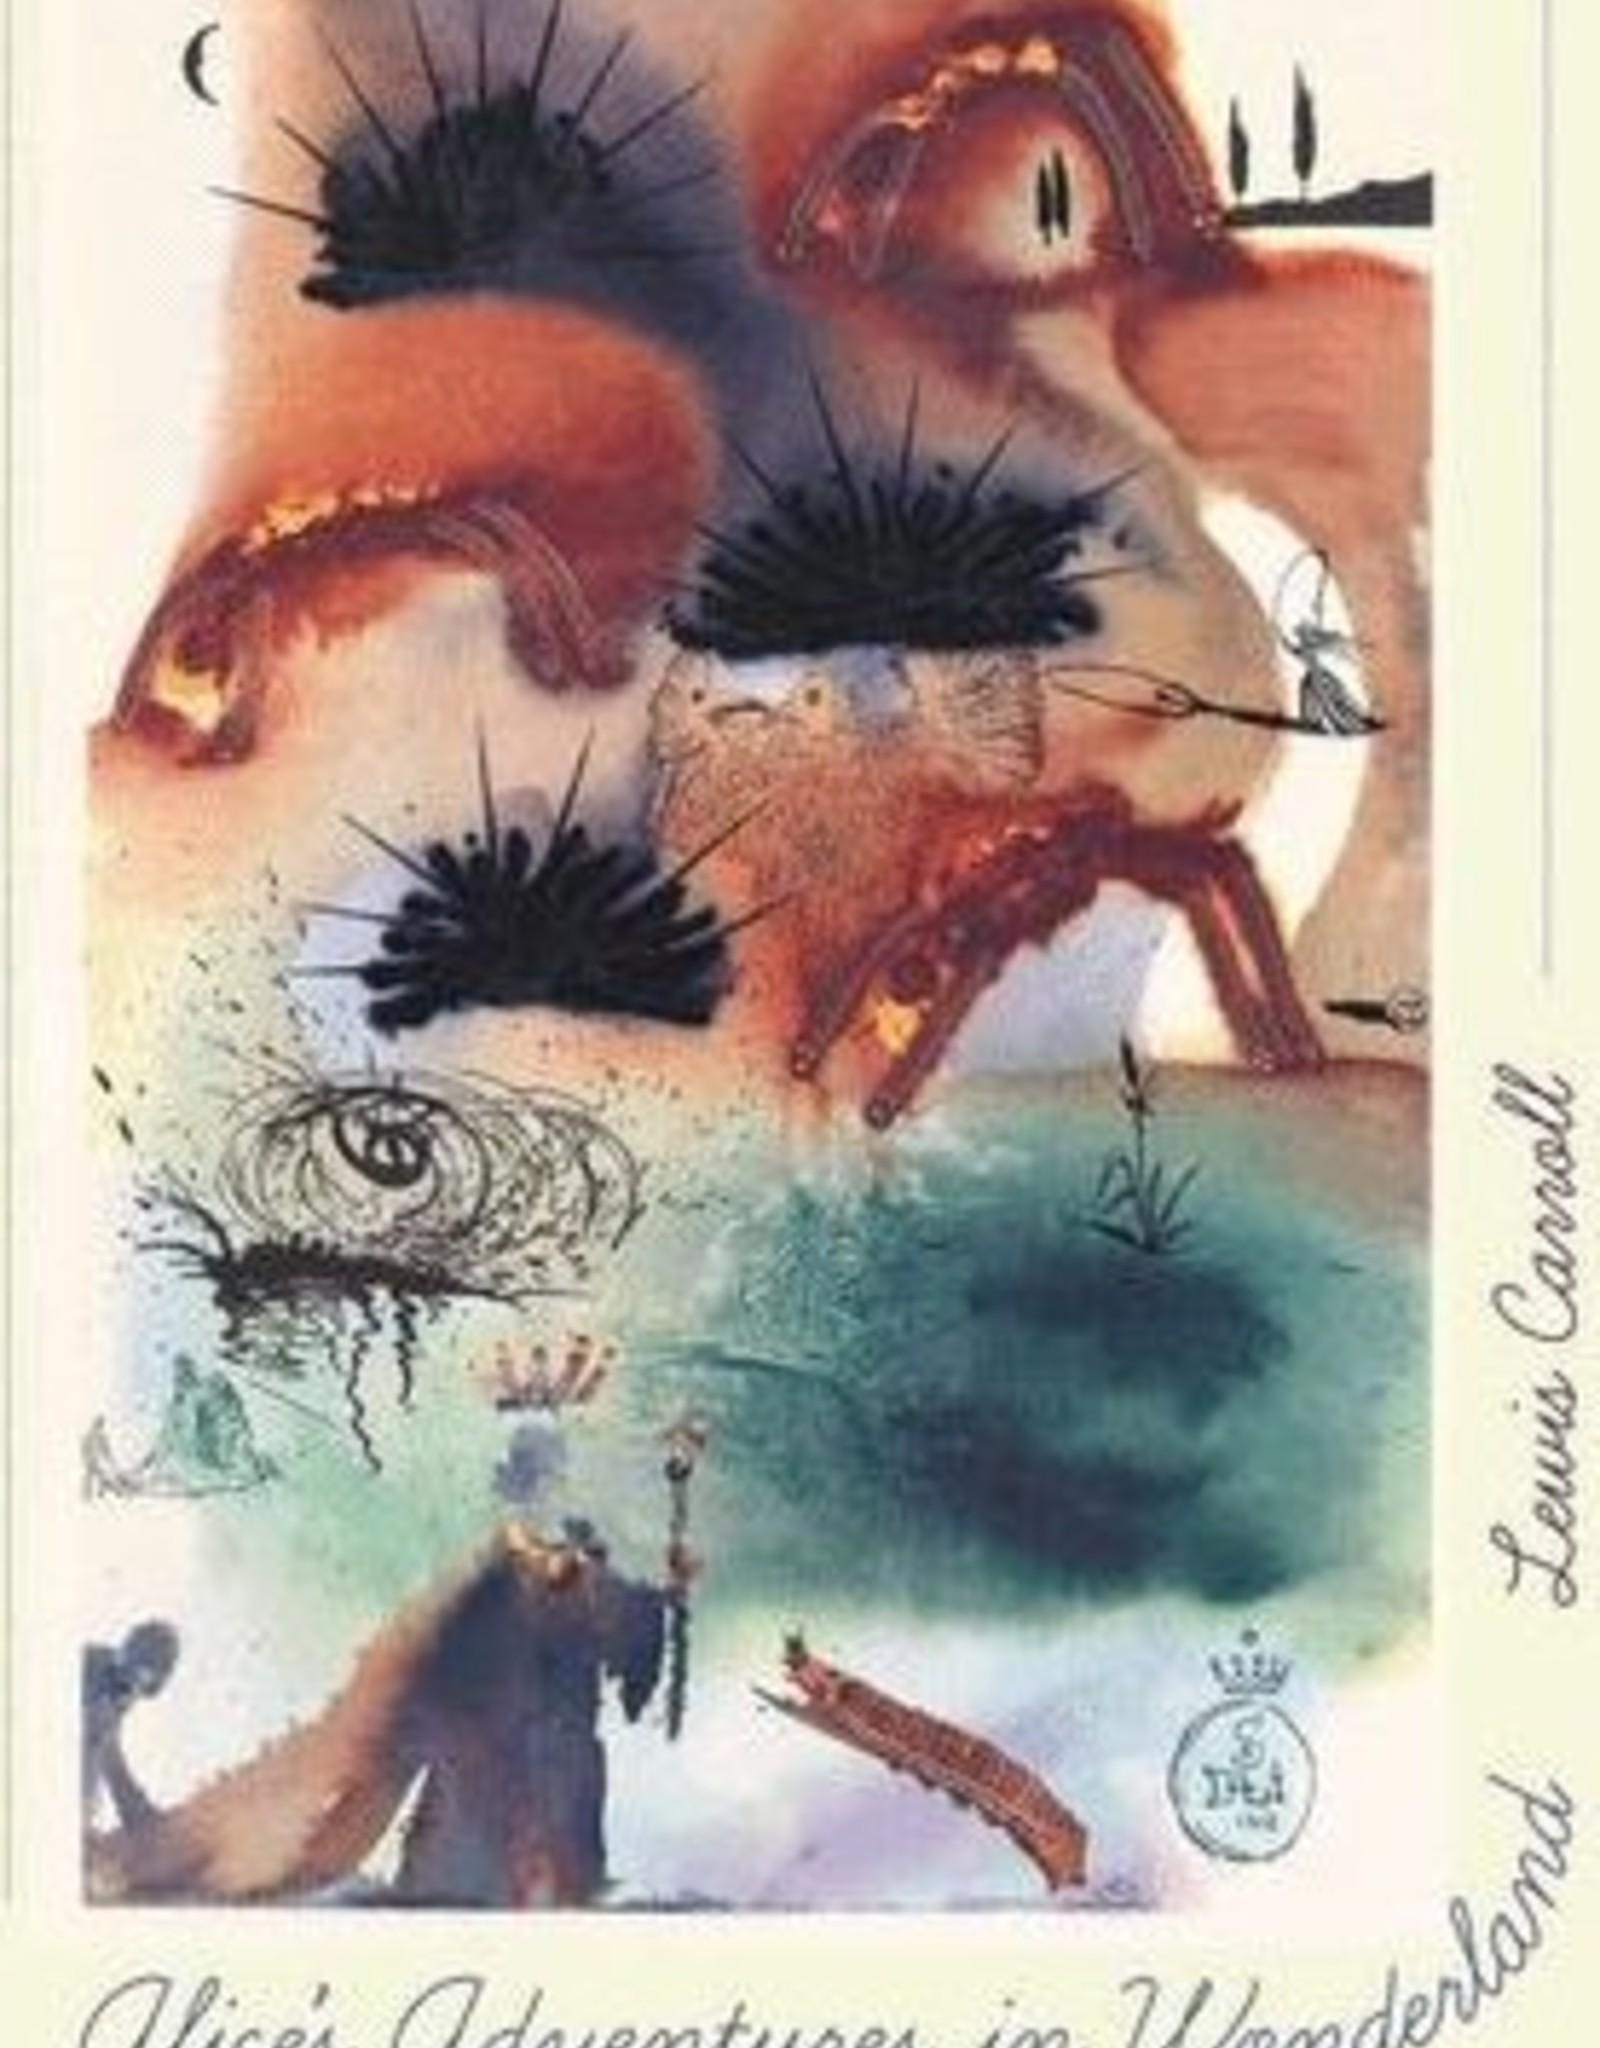 Alice's Adventures in Wonderland Salvador Dali